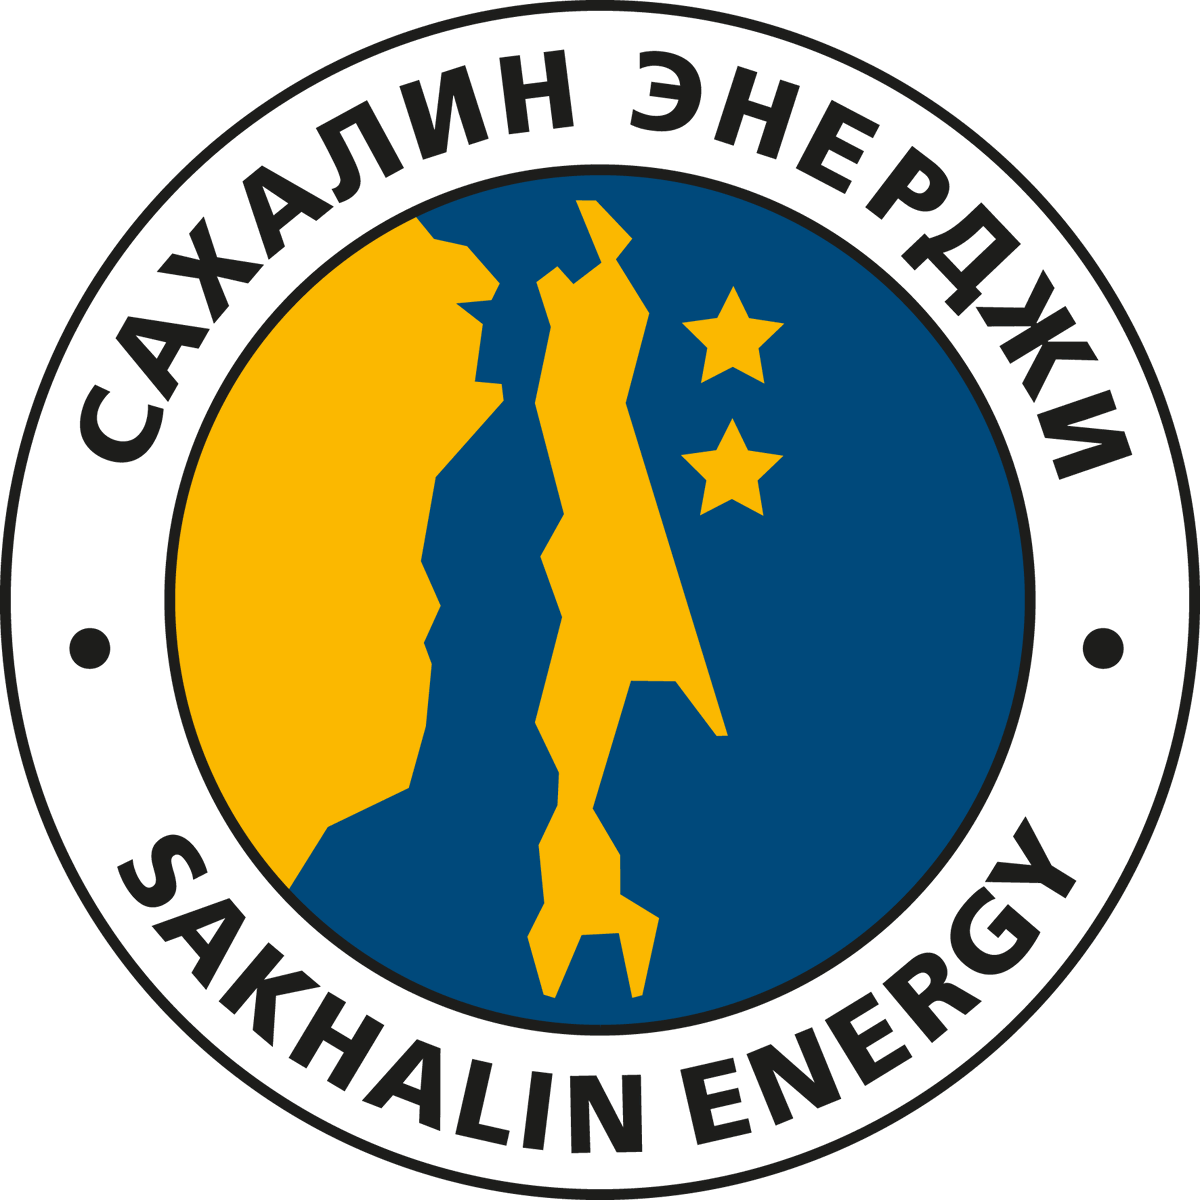 Sakhalin energy investment cintas investment